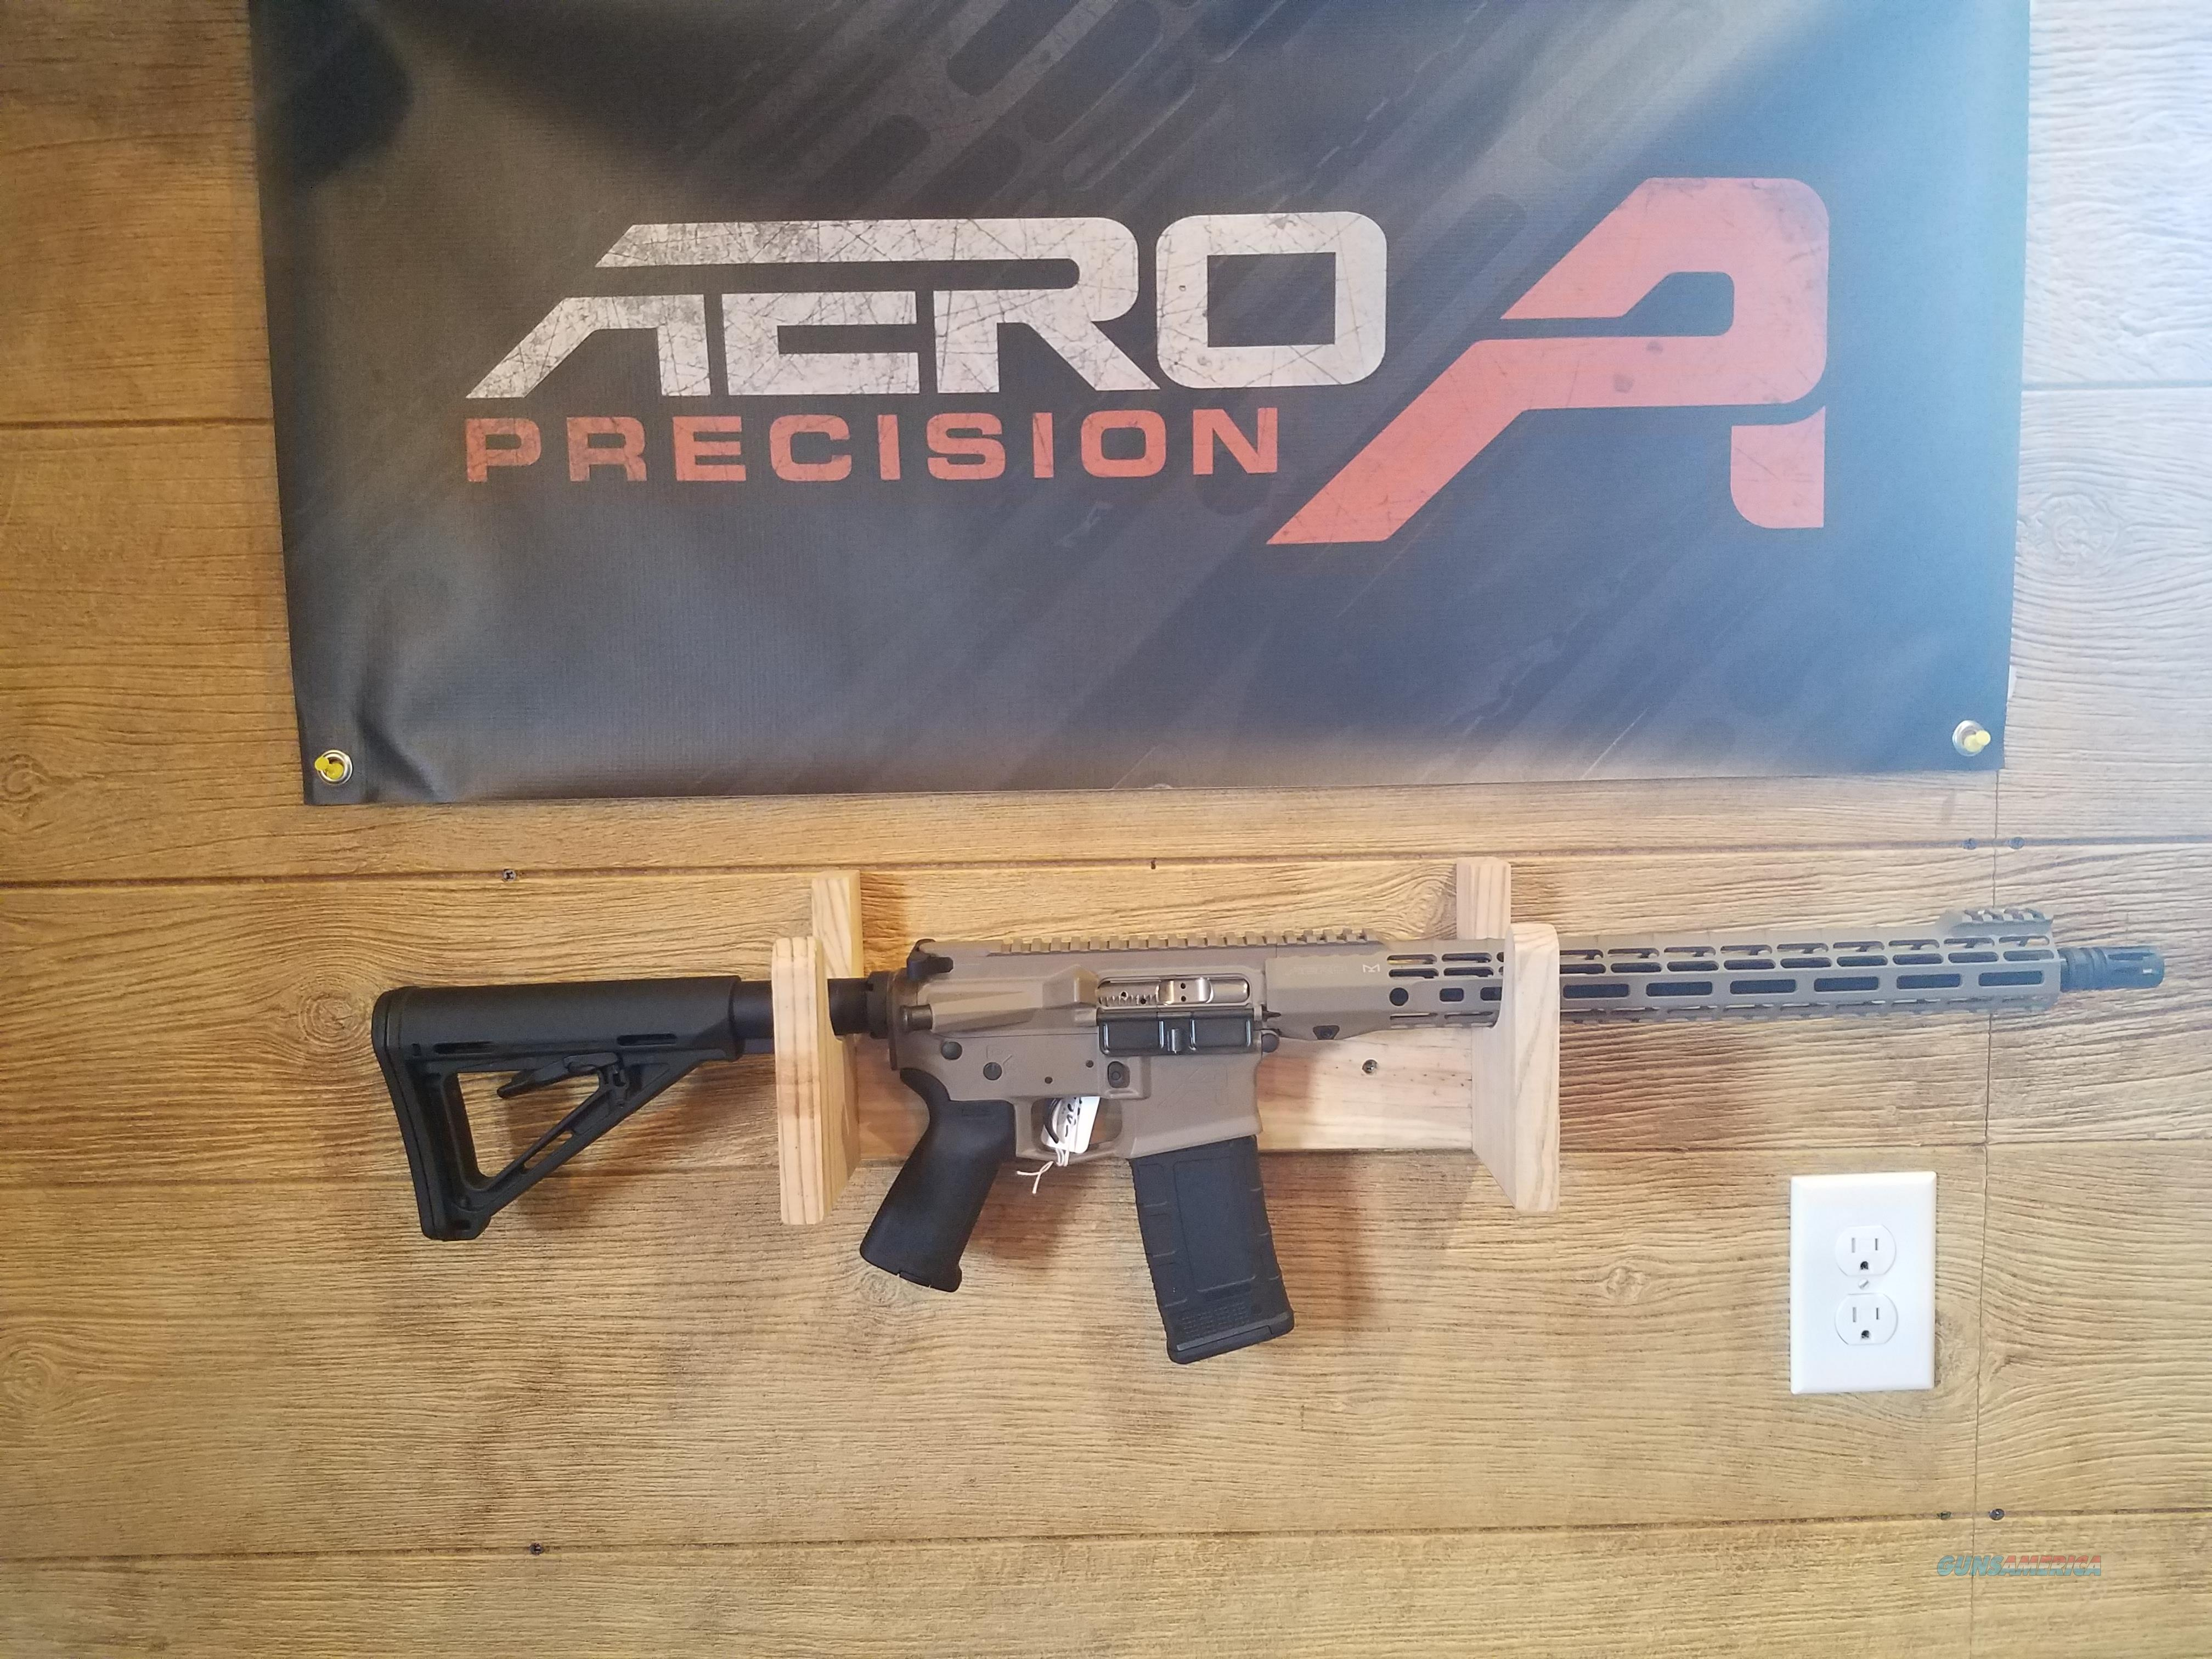 Aero Precision M4 e1  Guns > Rifles > Aero Precision > Aero Precision Rifles